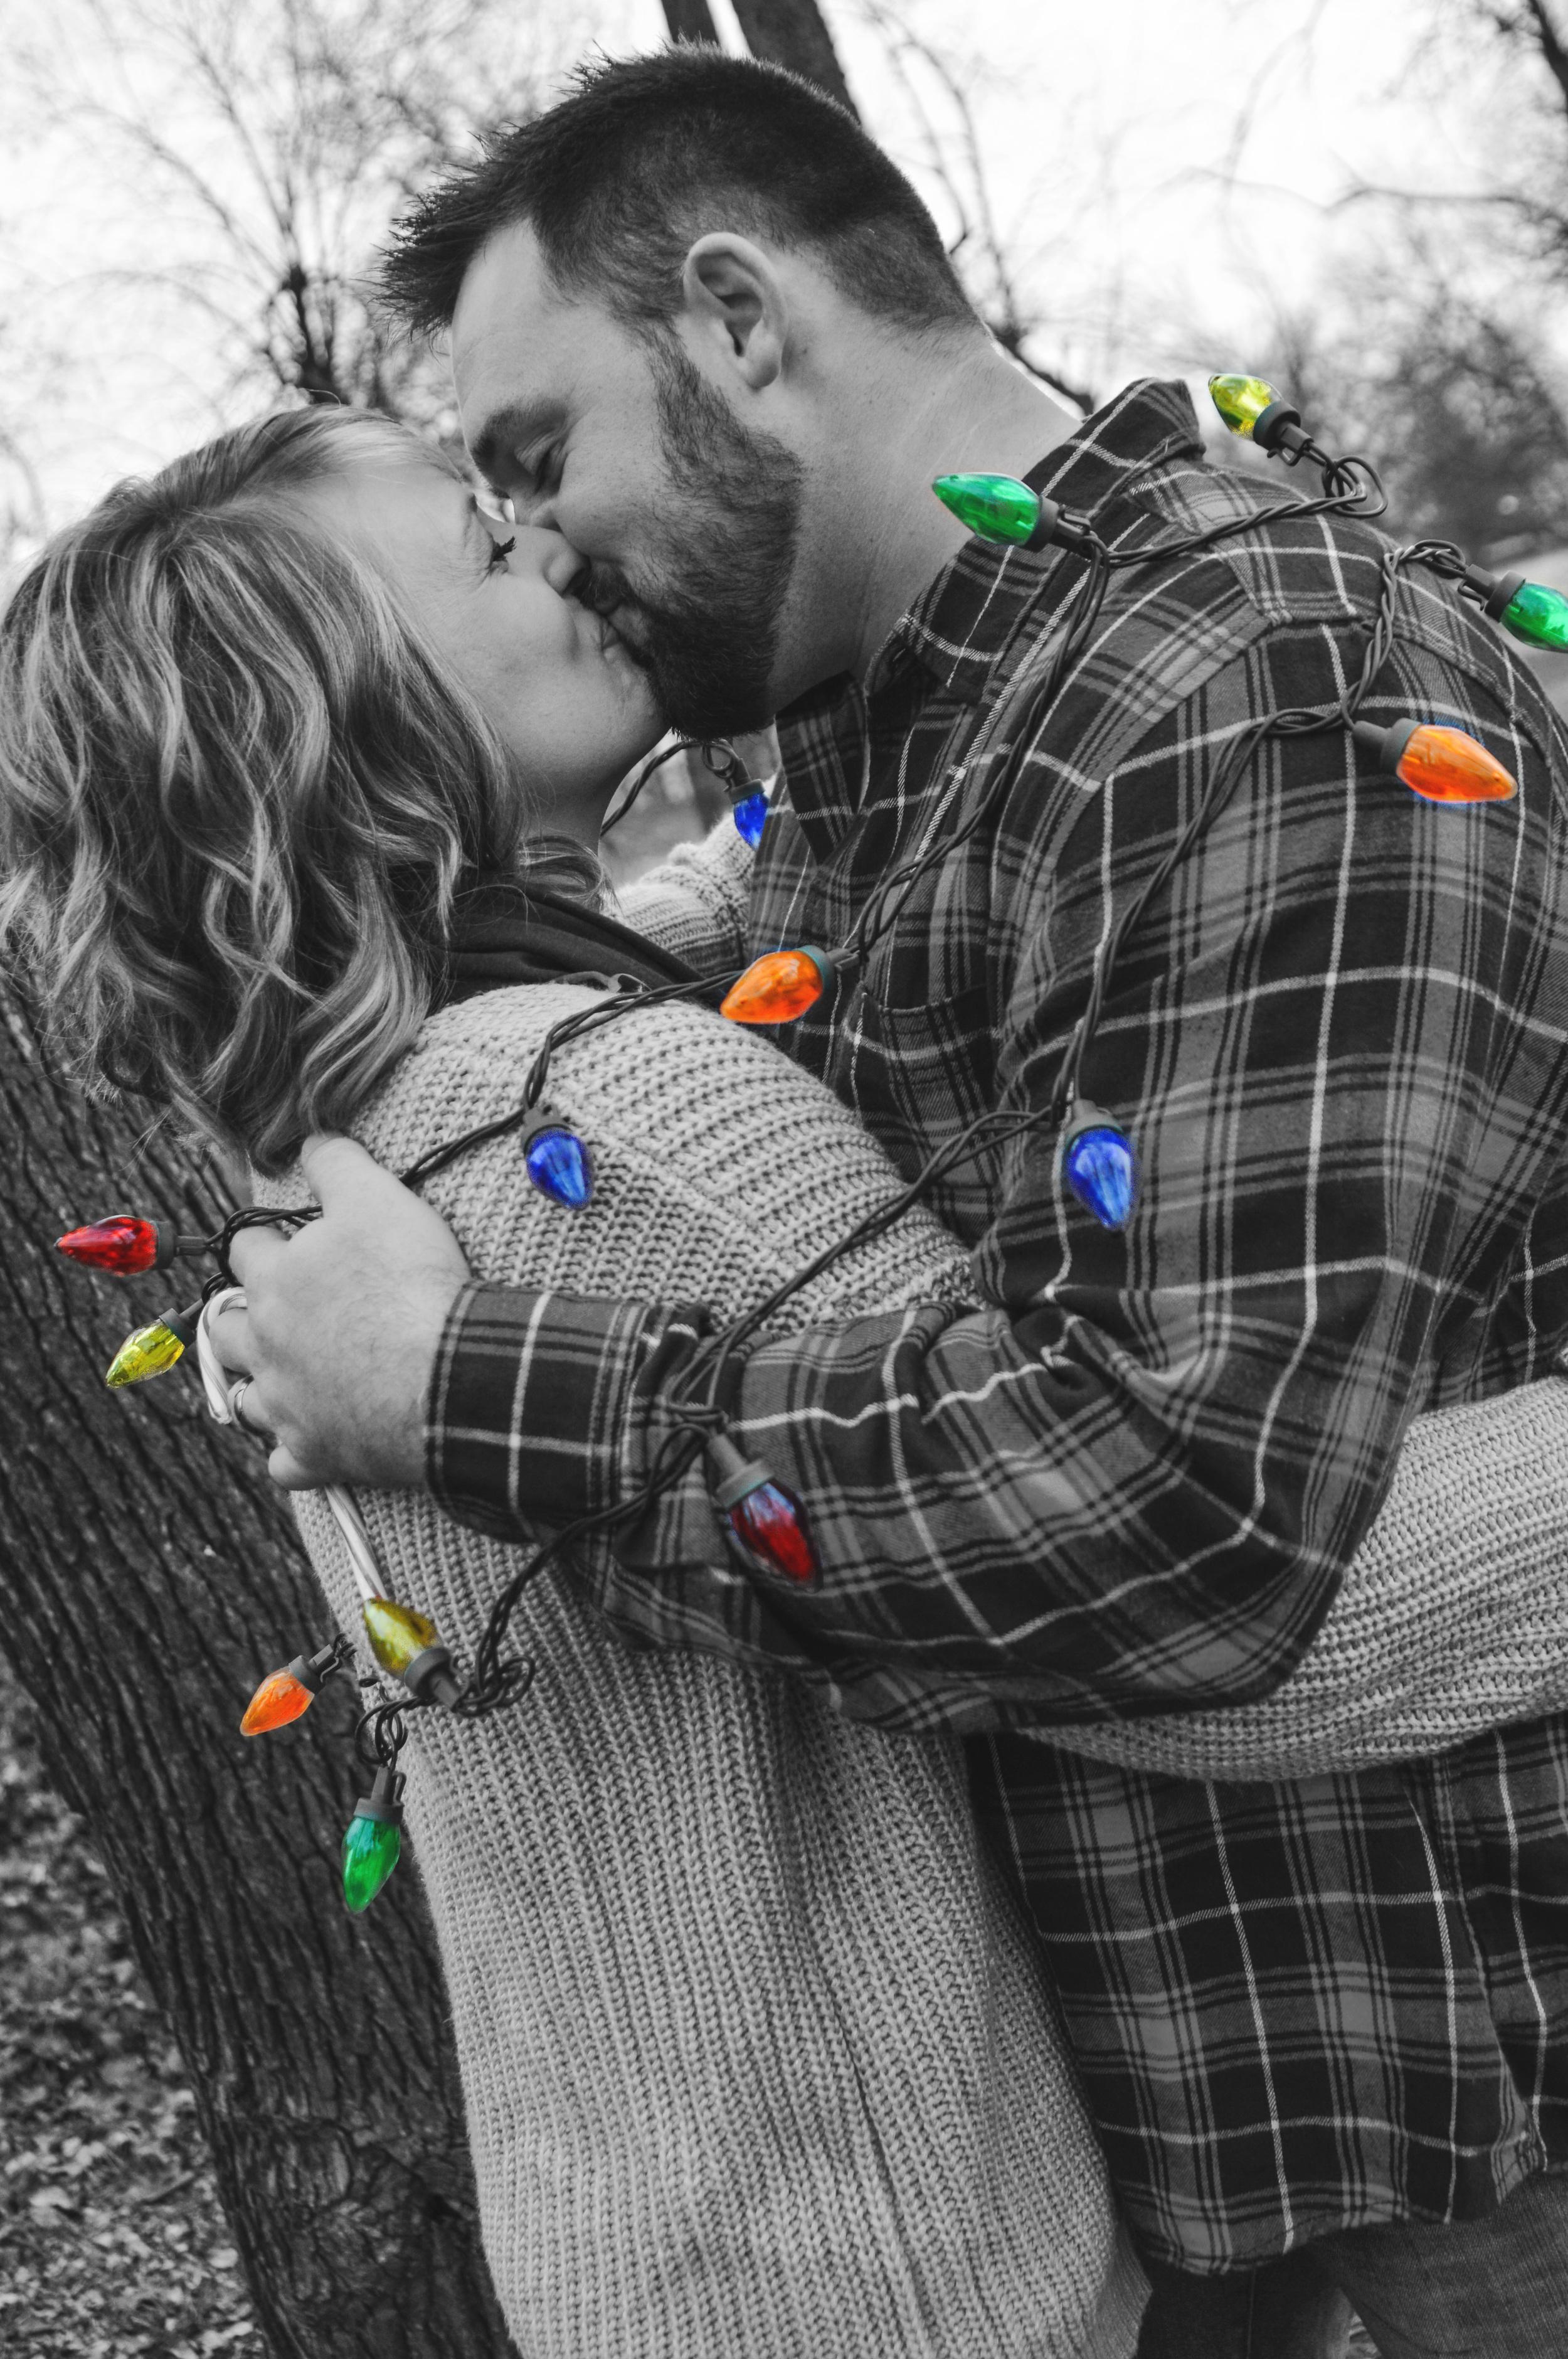 christmaslights-allwrappedup-familyphotos-joplinmissouri-photosbyariel